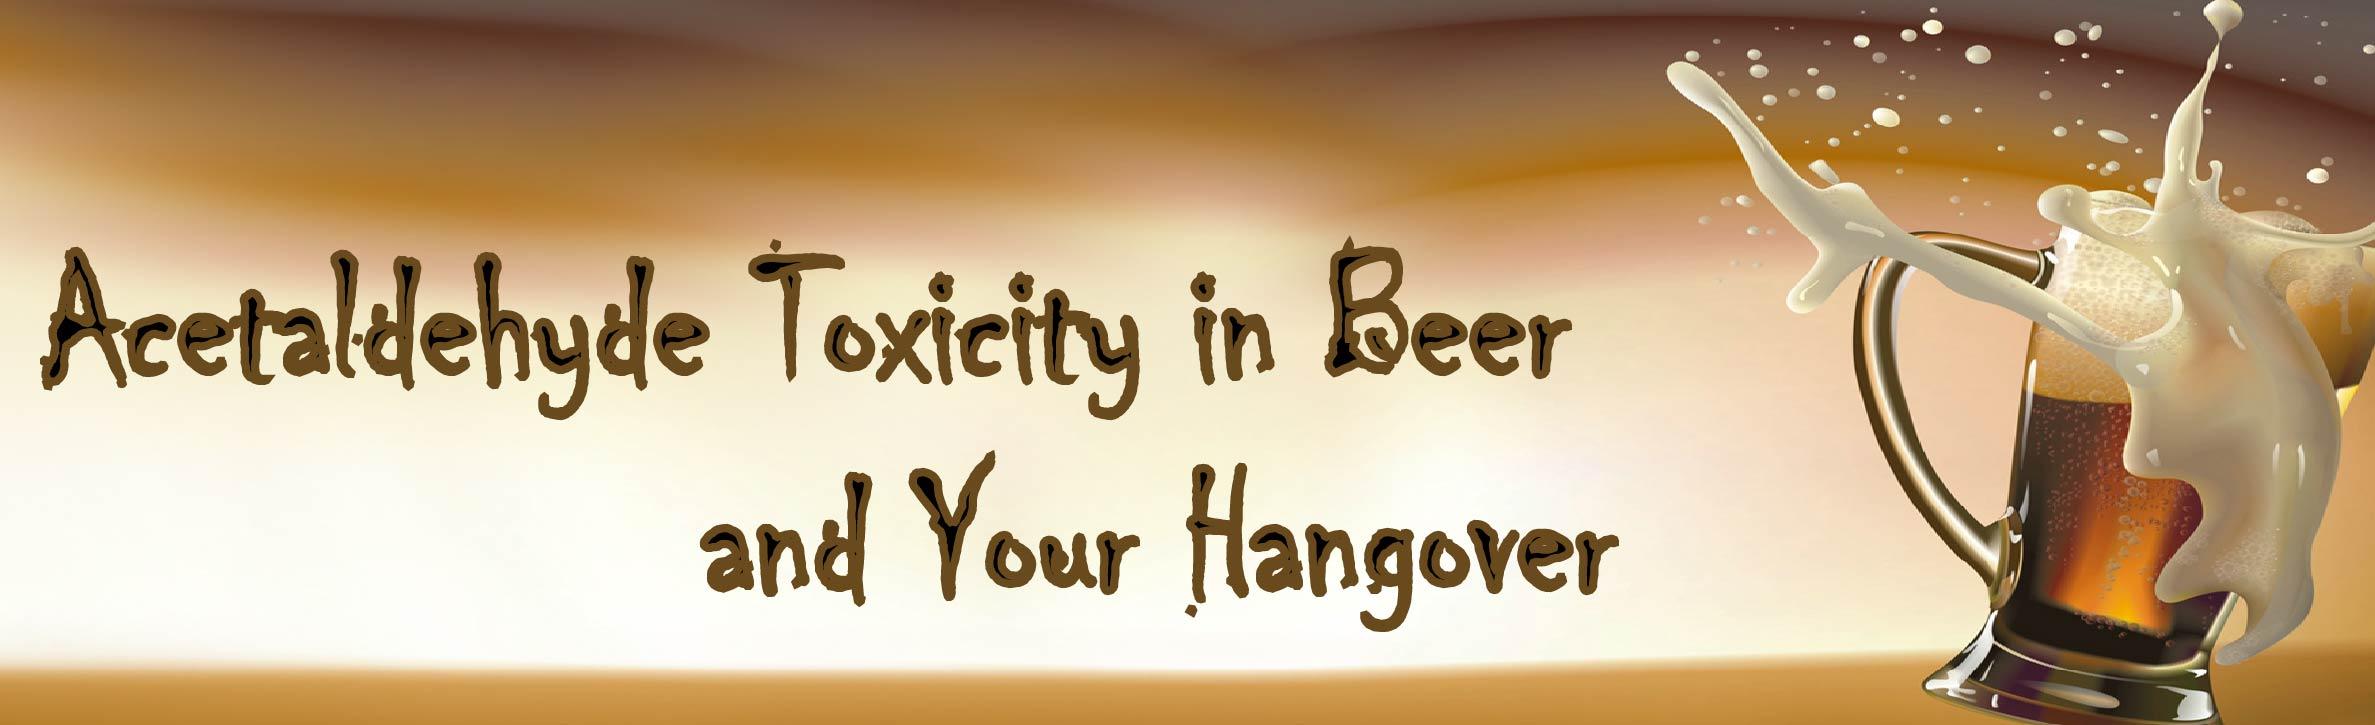 acetaldehyde beer  acetaldehyde toxicity and your hangover